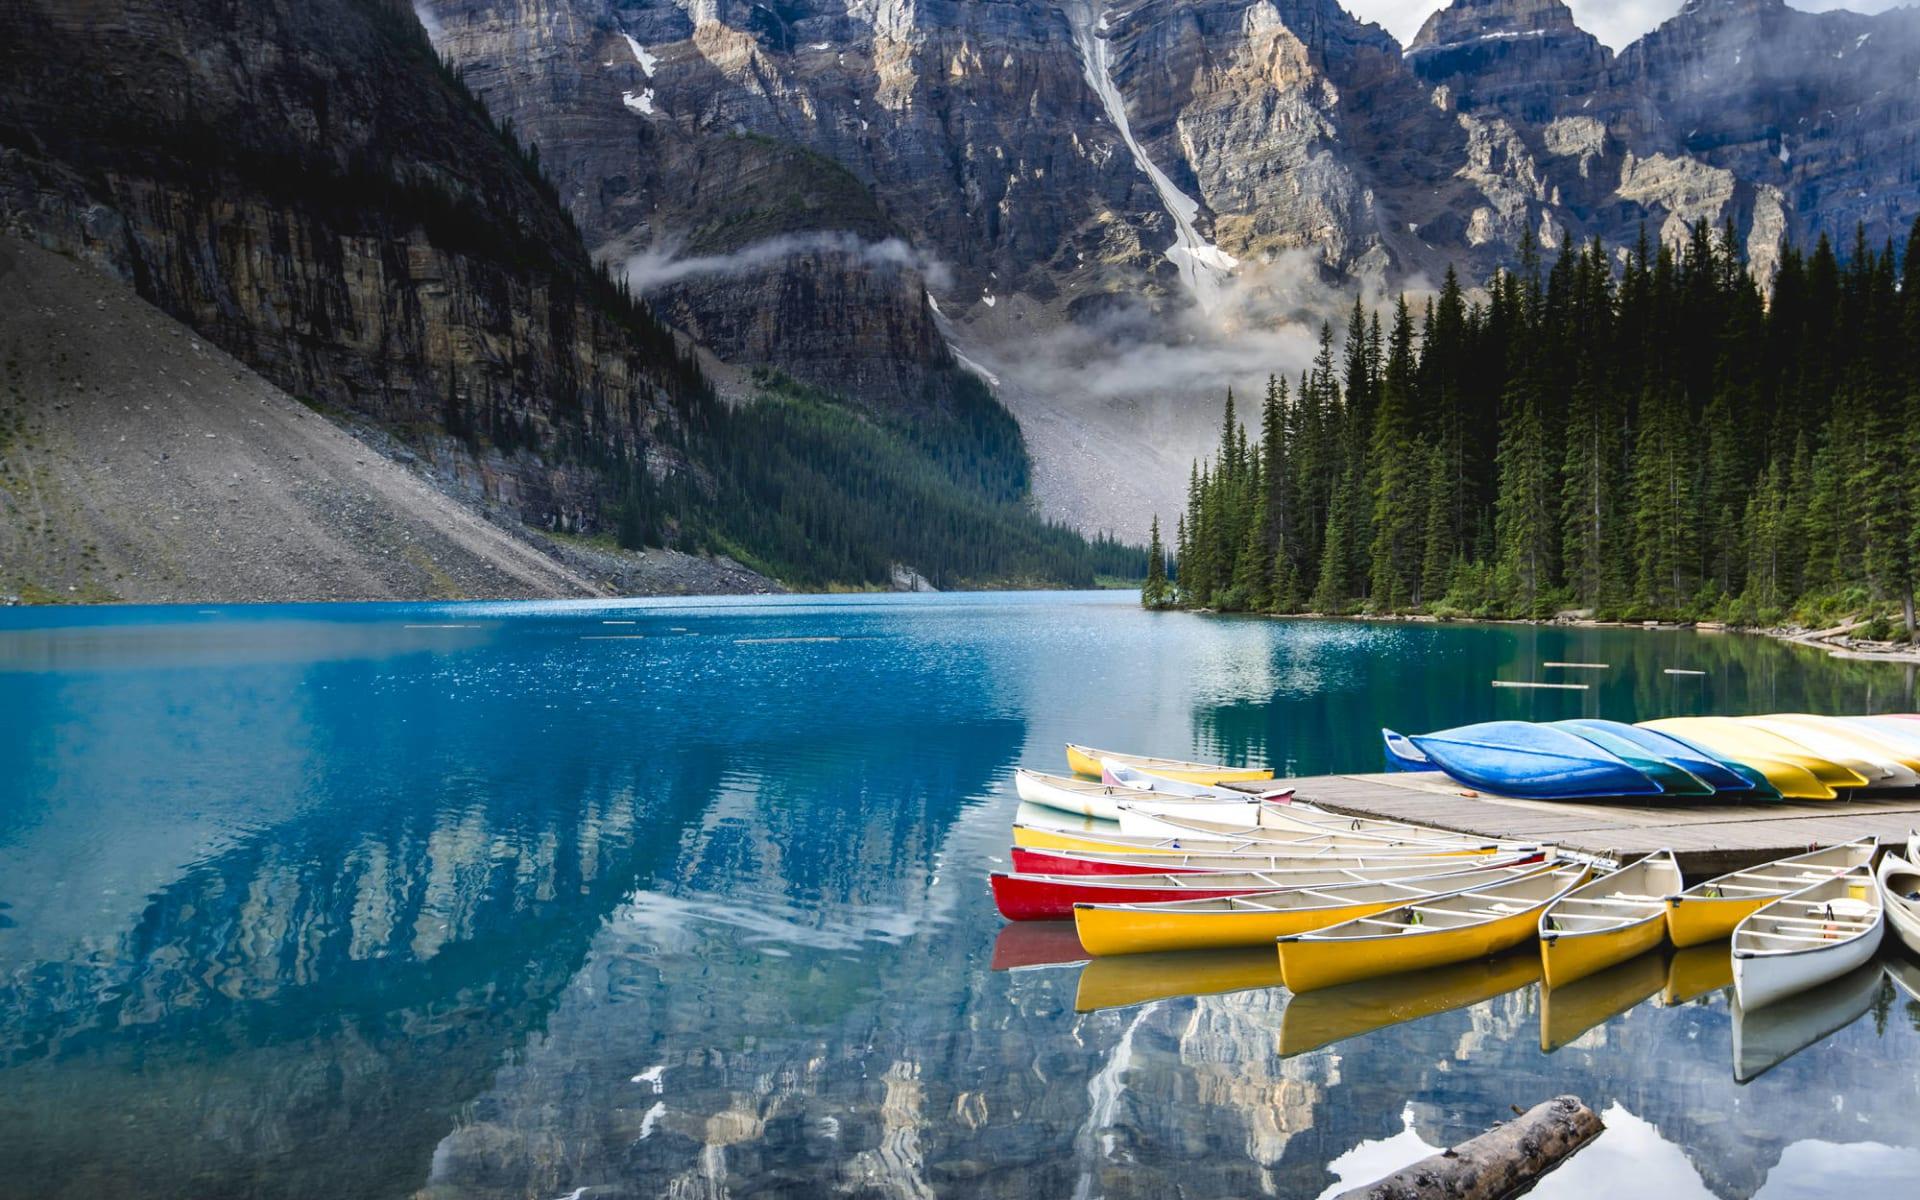 Westkanada Classic 22 Tage ab Vancouver: Banff Nationalpark - Moraine Lake